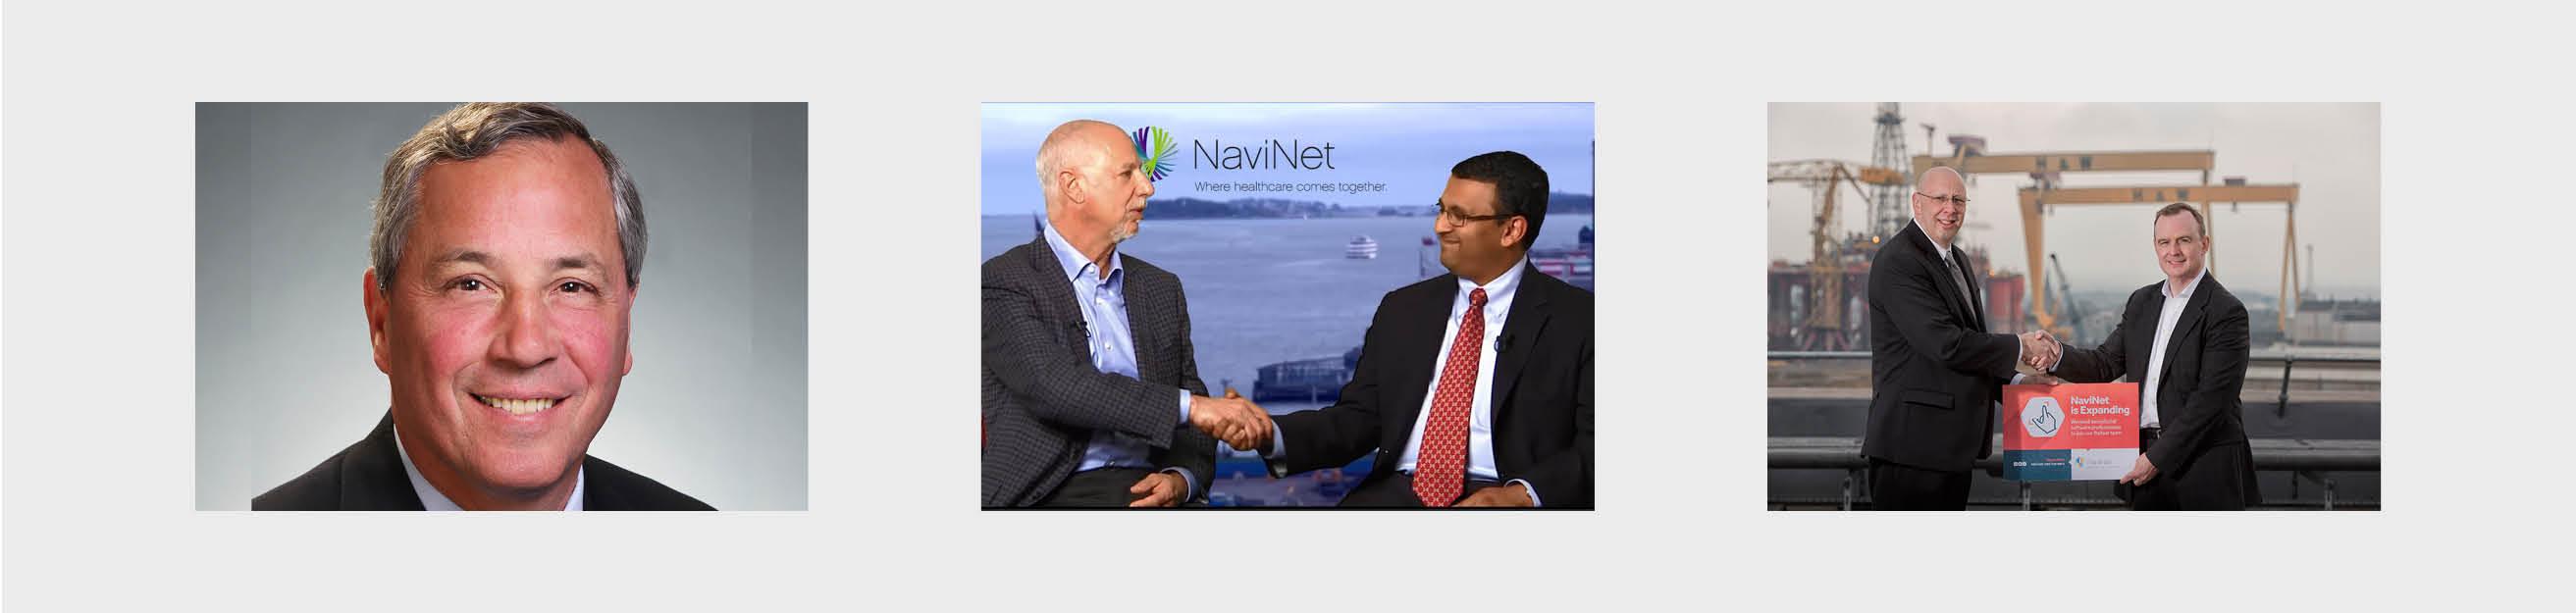 NaviNet images